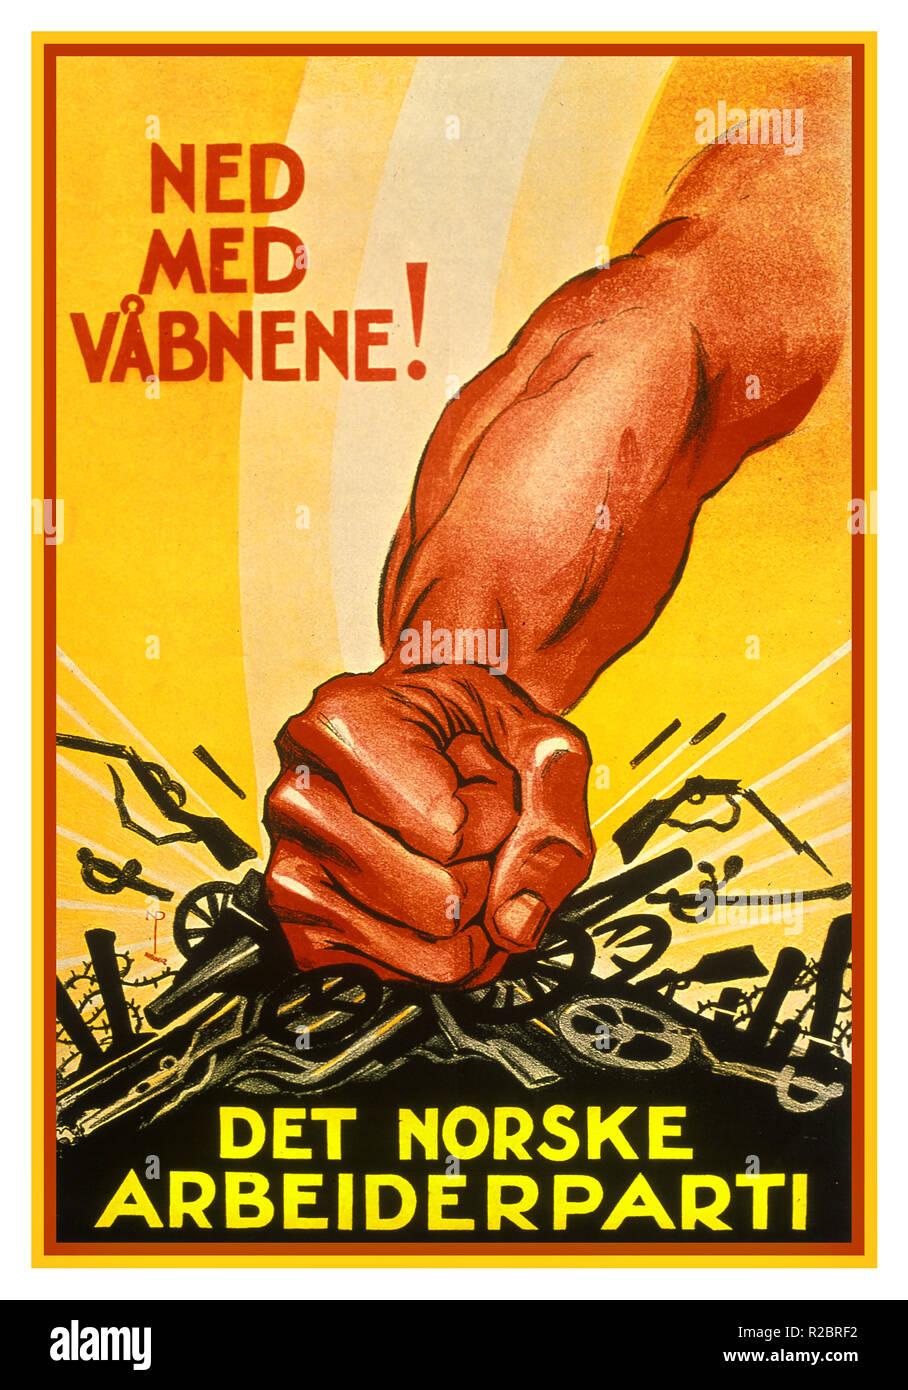 "Vintage norwegische Propagandaplakat 1930 ""Mit den Armen"" (NED MED VABNENE!) Det norske Arbeiderparti"" der Norwegischen Arbeiterpartei' Stockbild"